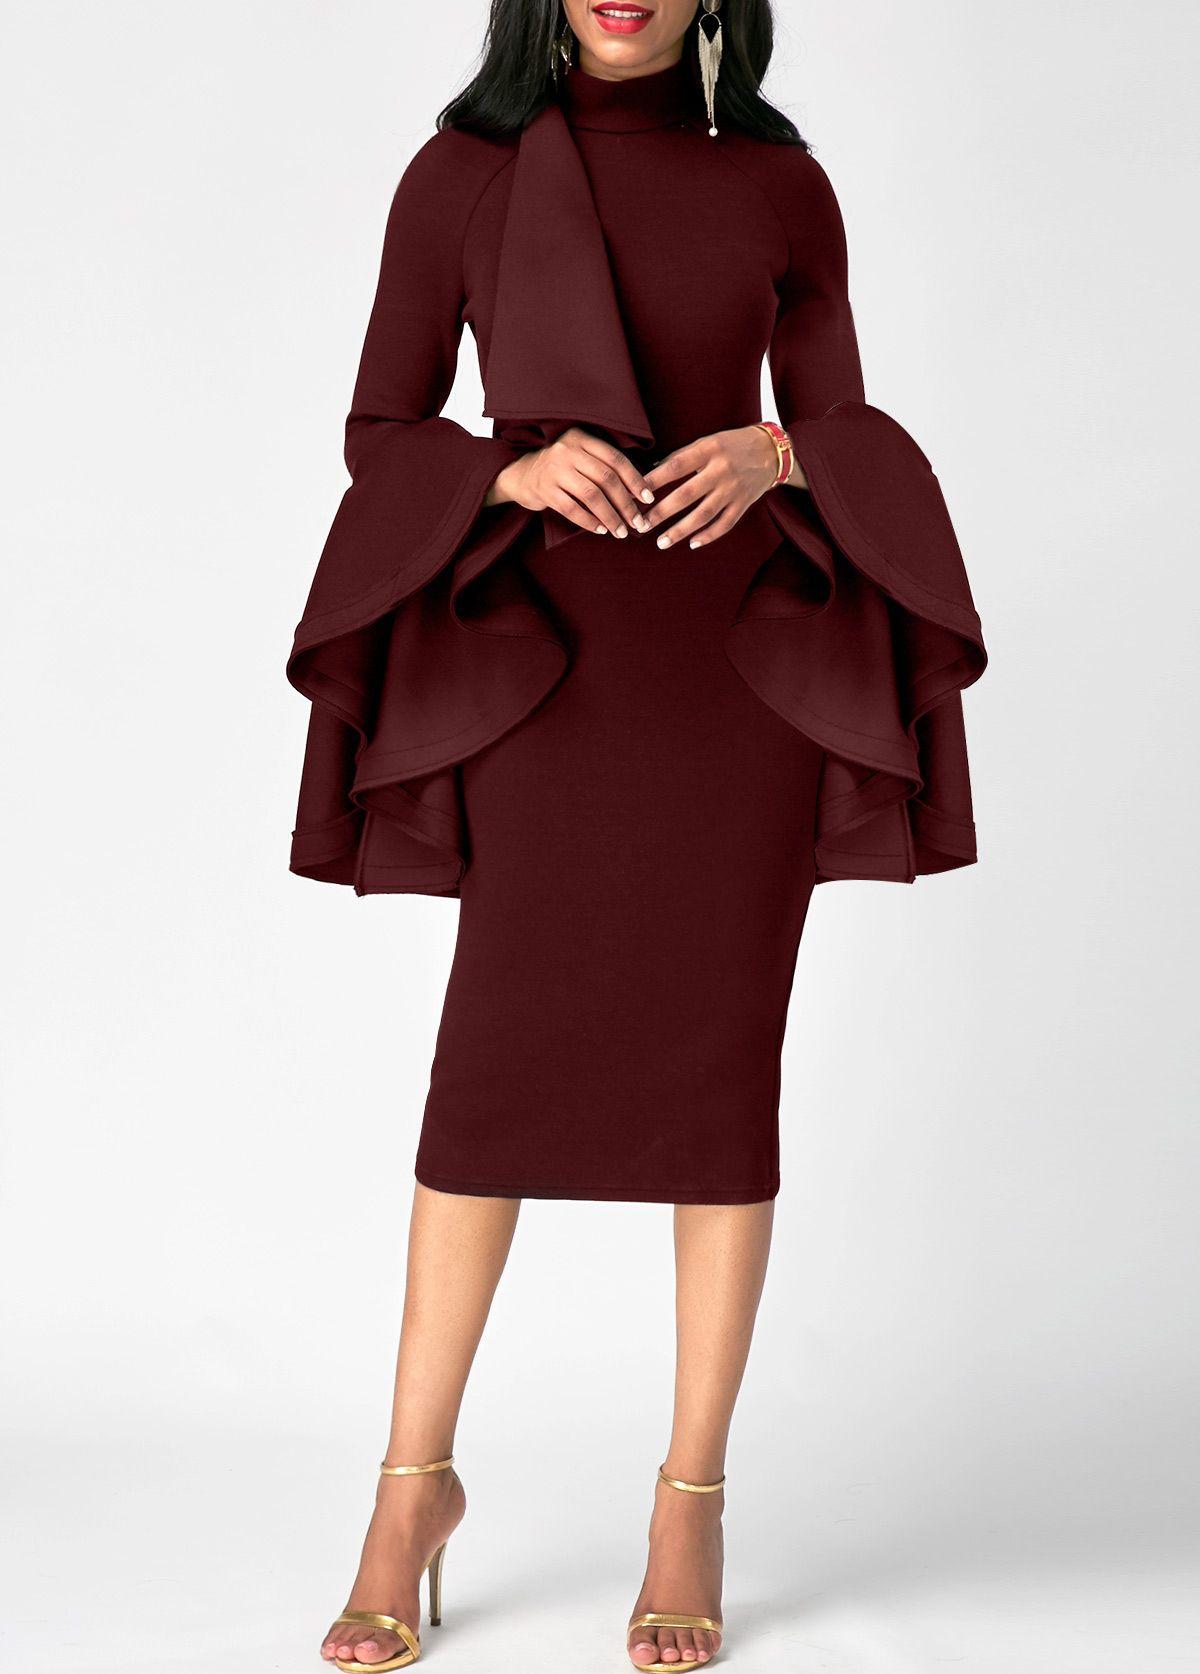 Flare sleeve mock neck burgundy sheath dress on sale only